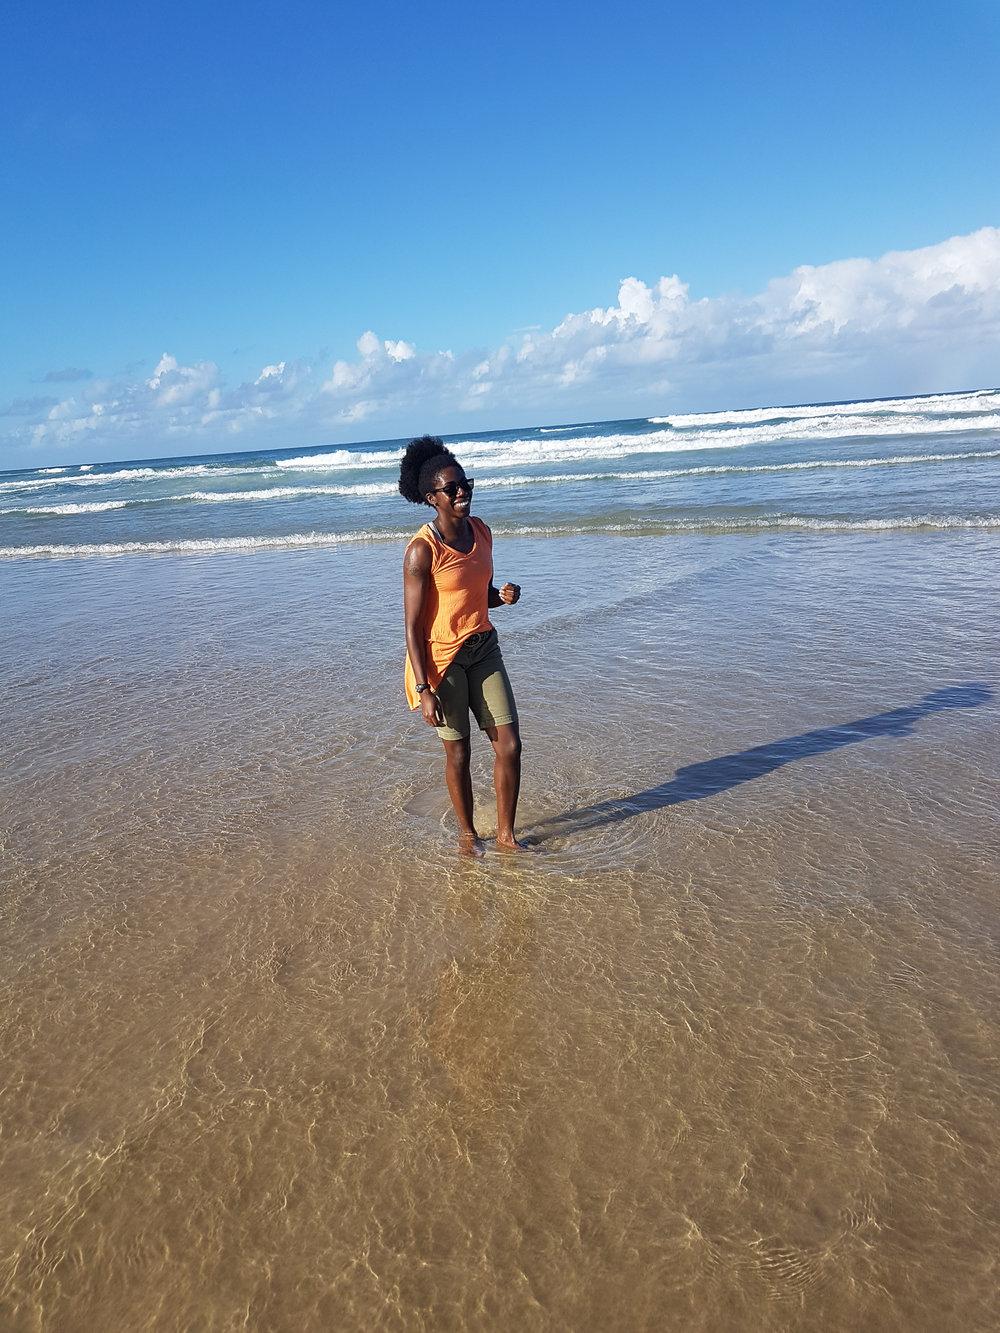 Basking in ocean goodness in Gold Coast, Australia